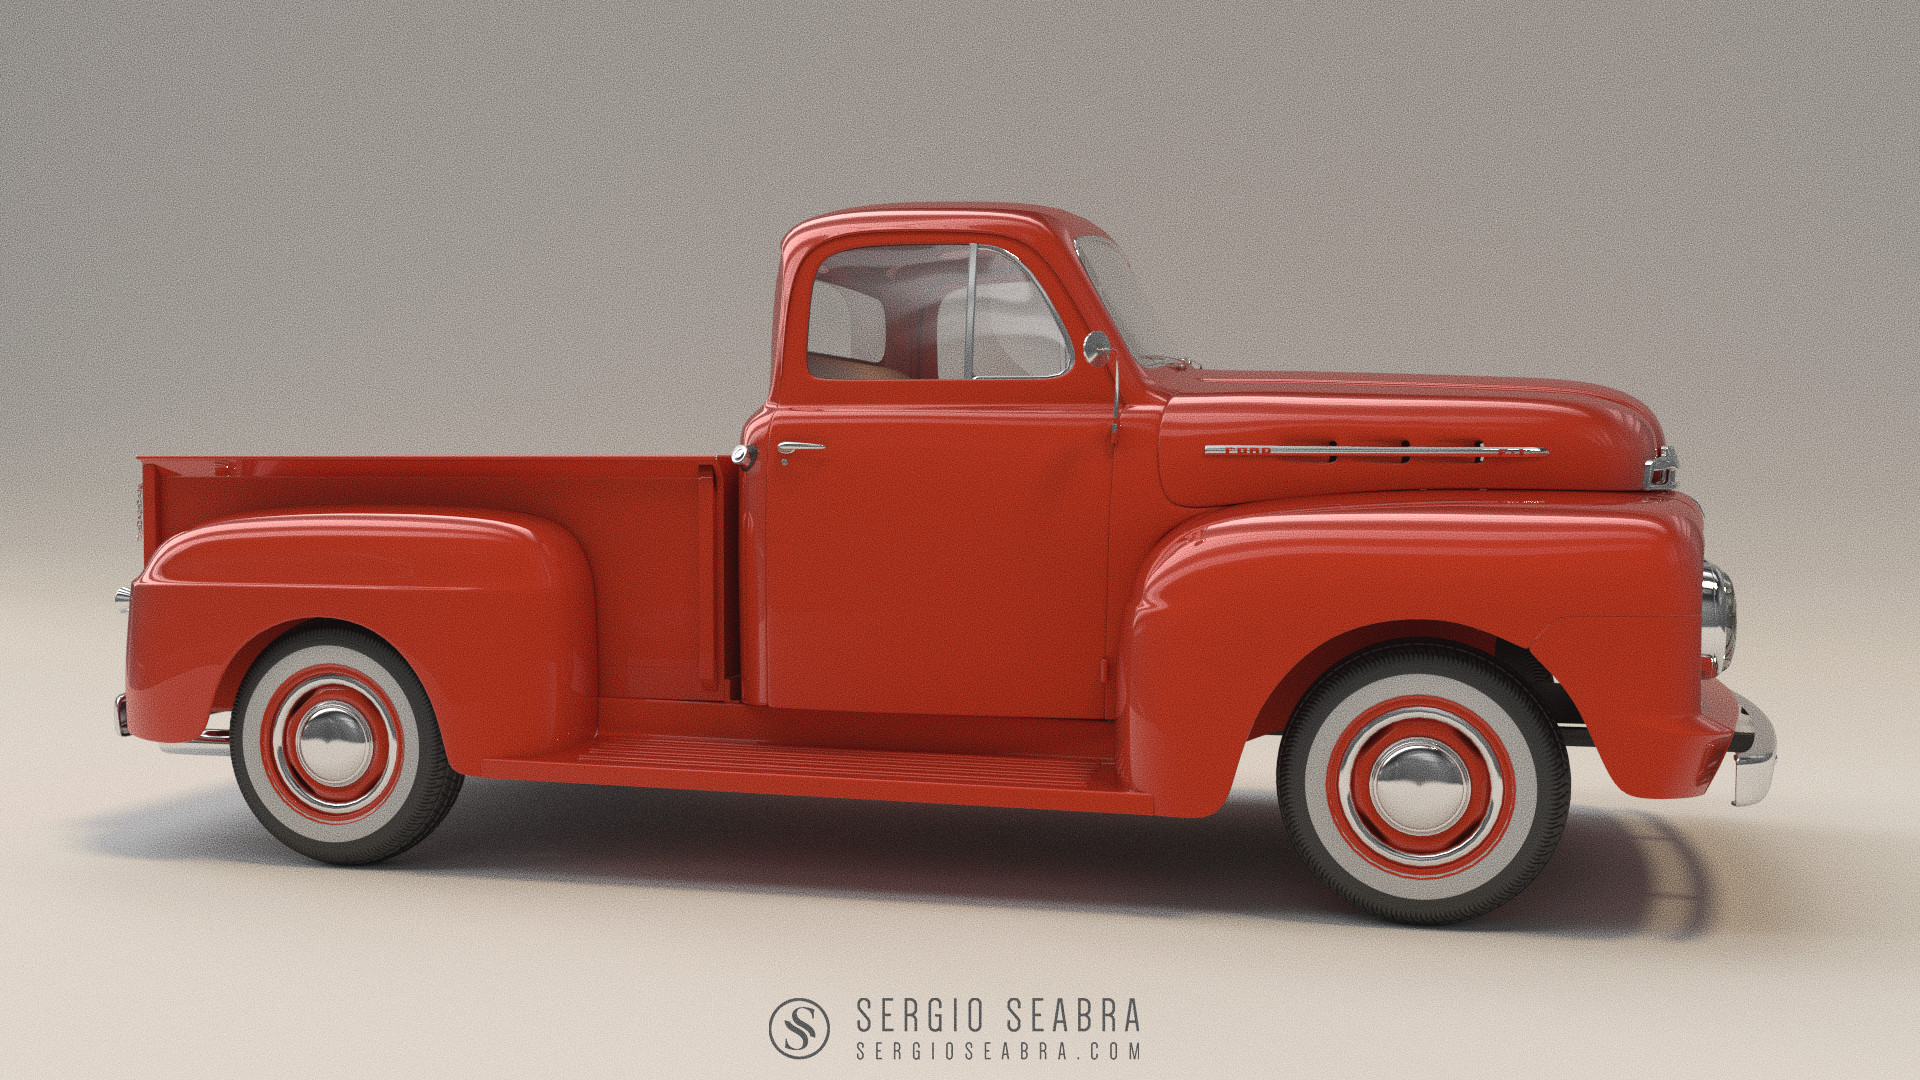 Sergio seabra 20171114 ford f1 layout 1